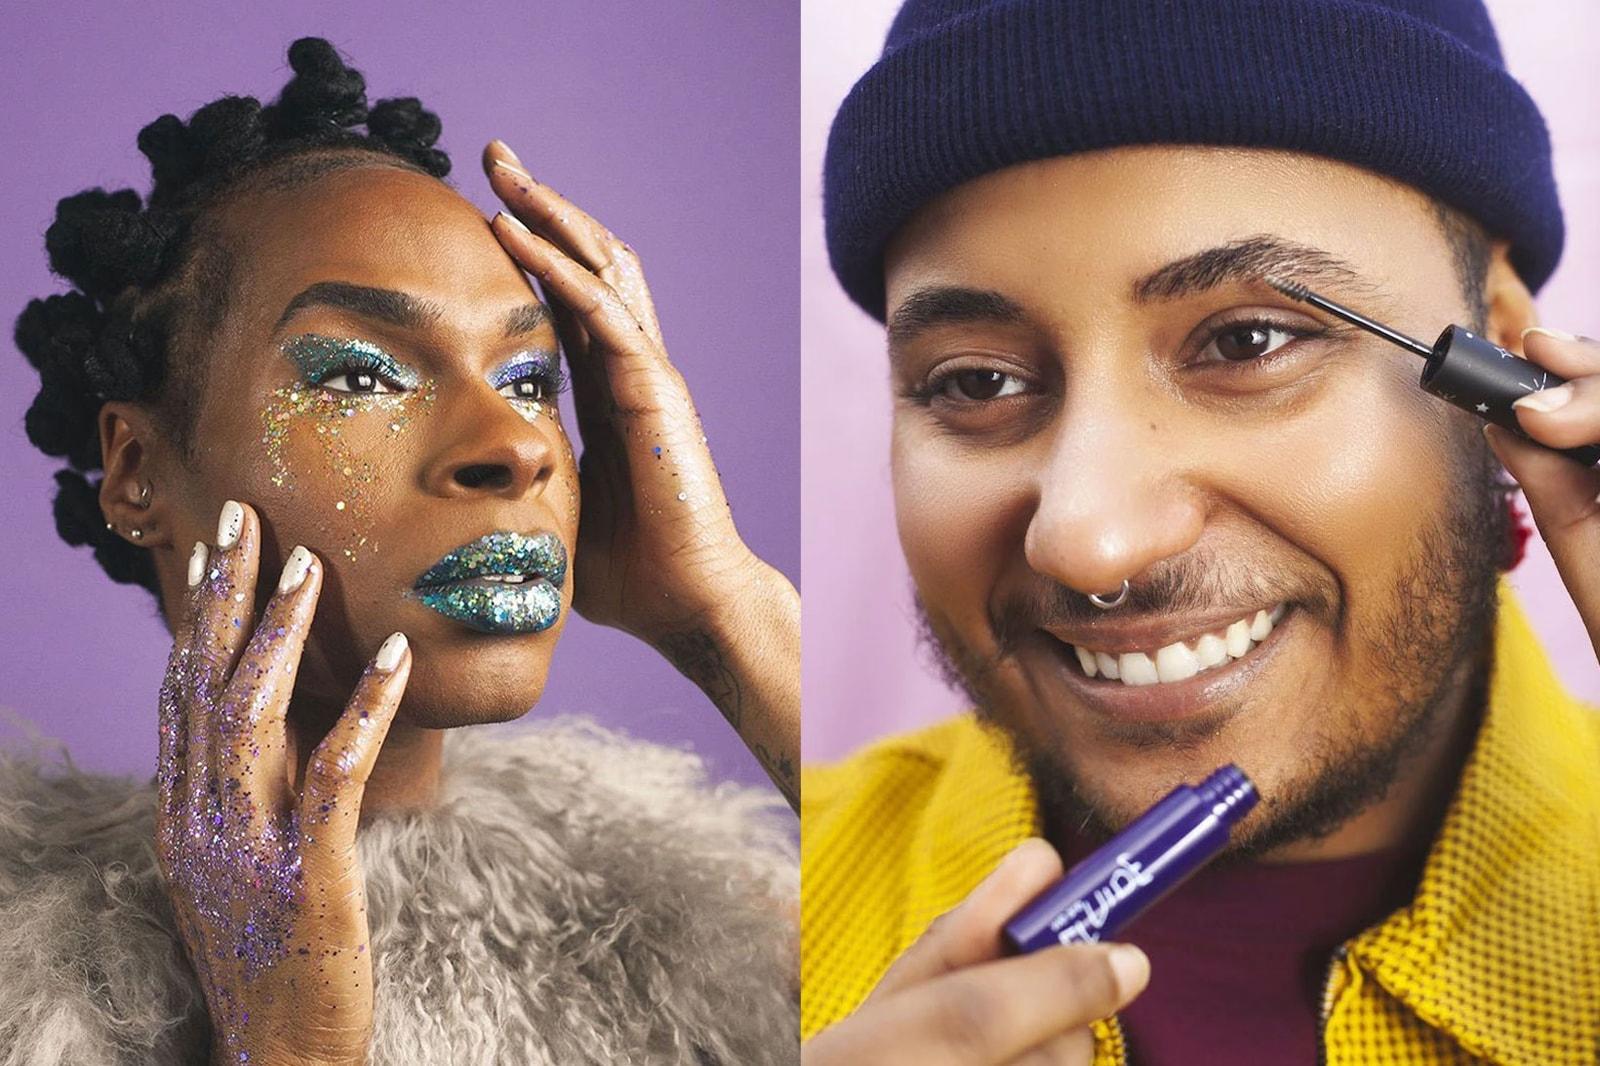 TooD eyeshadow metallic pink Gender neutral fluid Inclusive genderless Beauty Brands makeup skincare diversity inclusivity